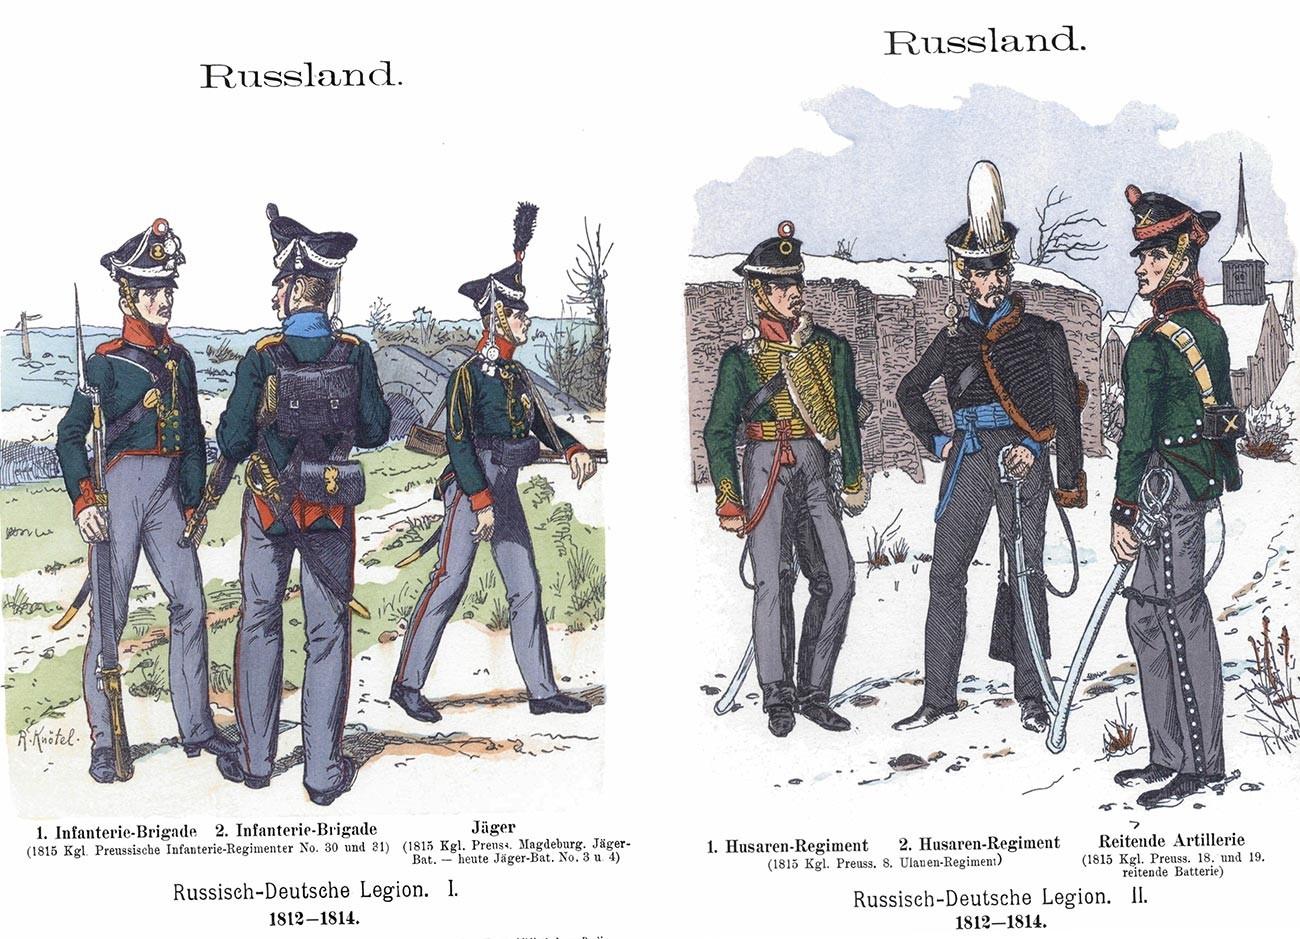 Руско-немачки легија 1812-1814. 1. Пешадијска бригада и стрелац (јегер); 2. Гусарски пук – Коњичка артиљерија.